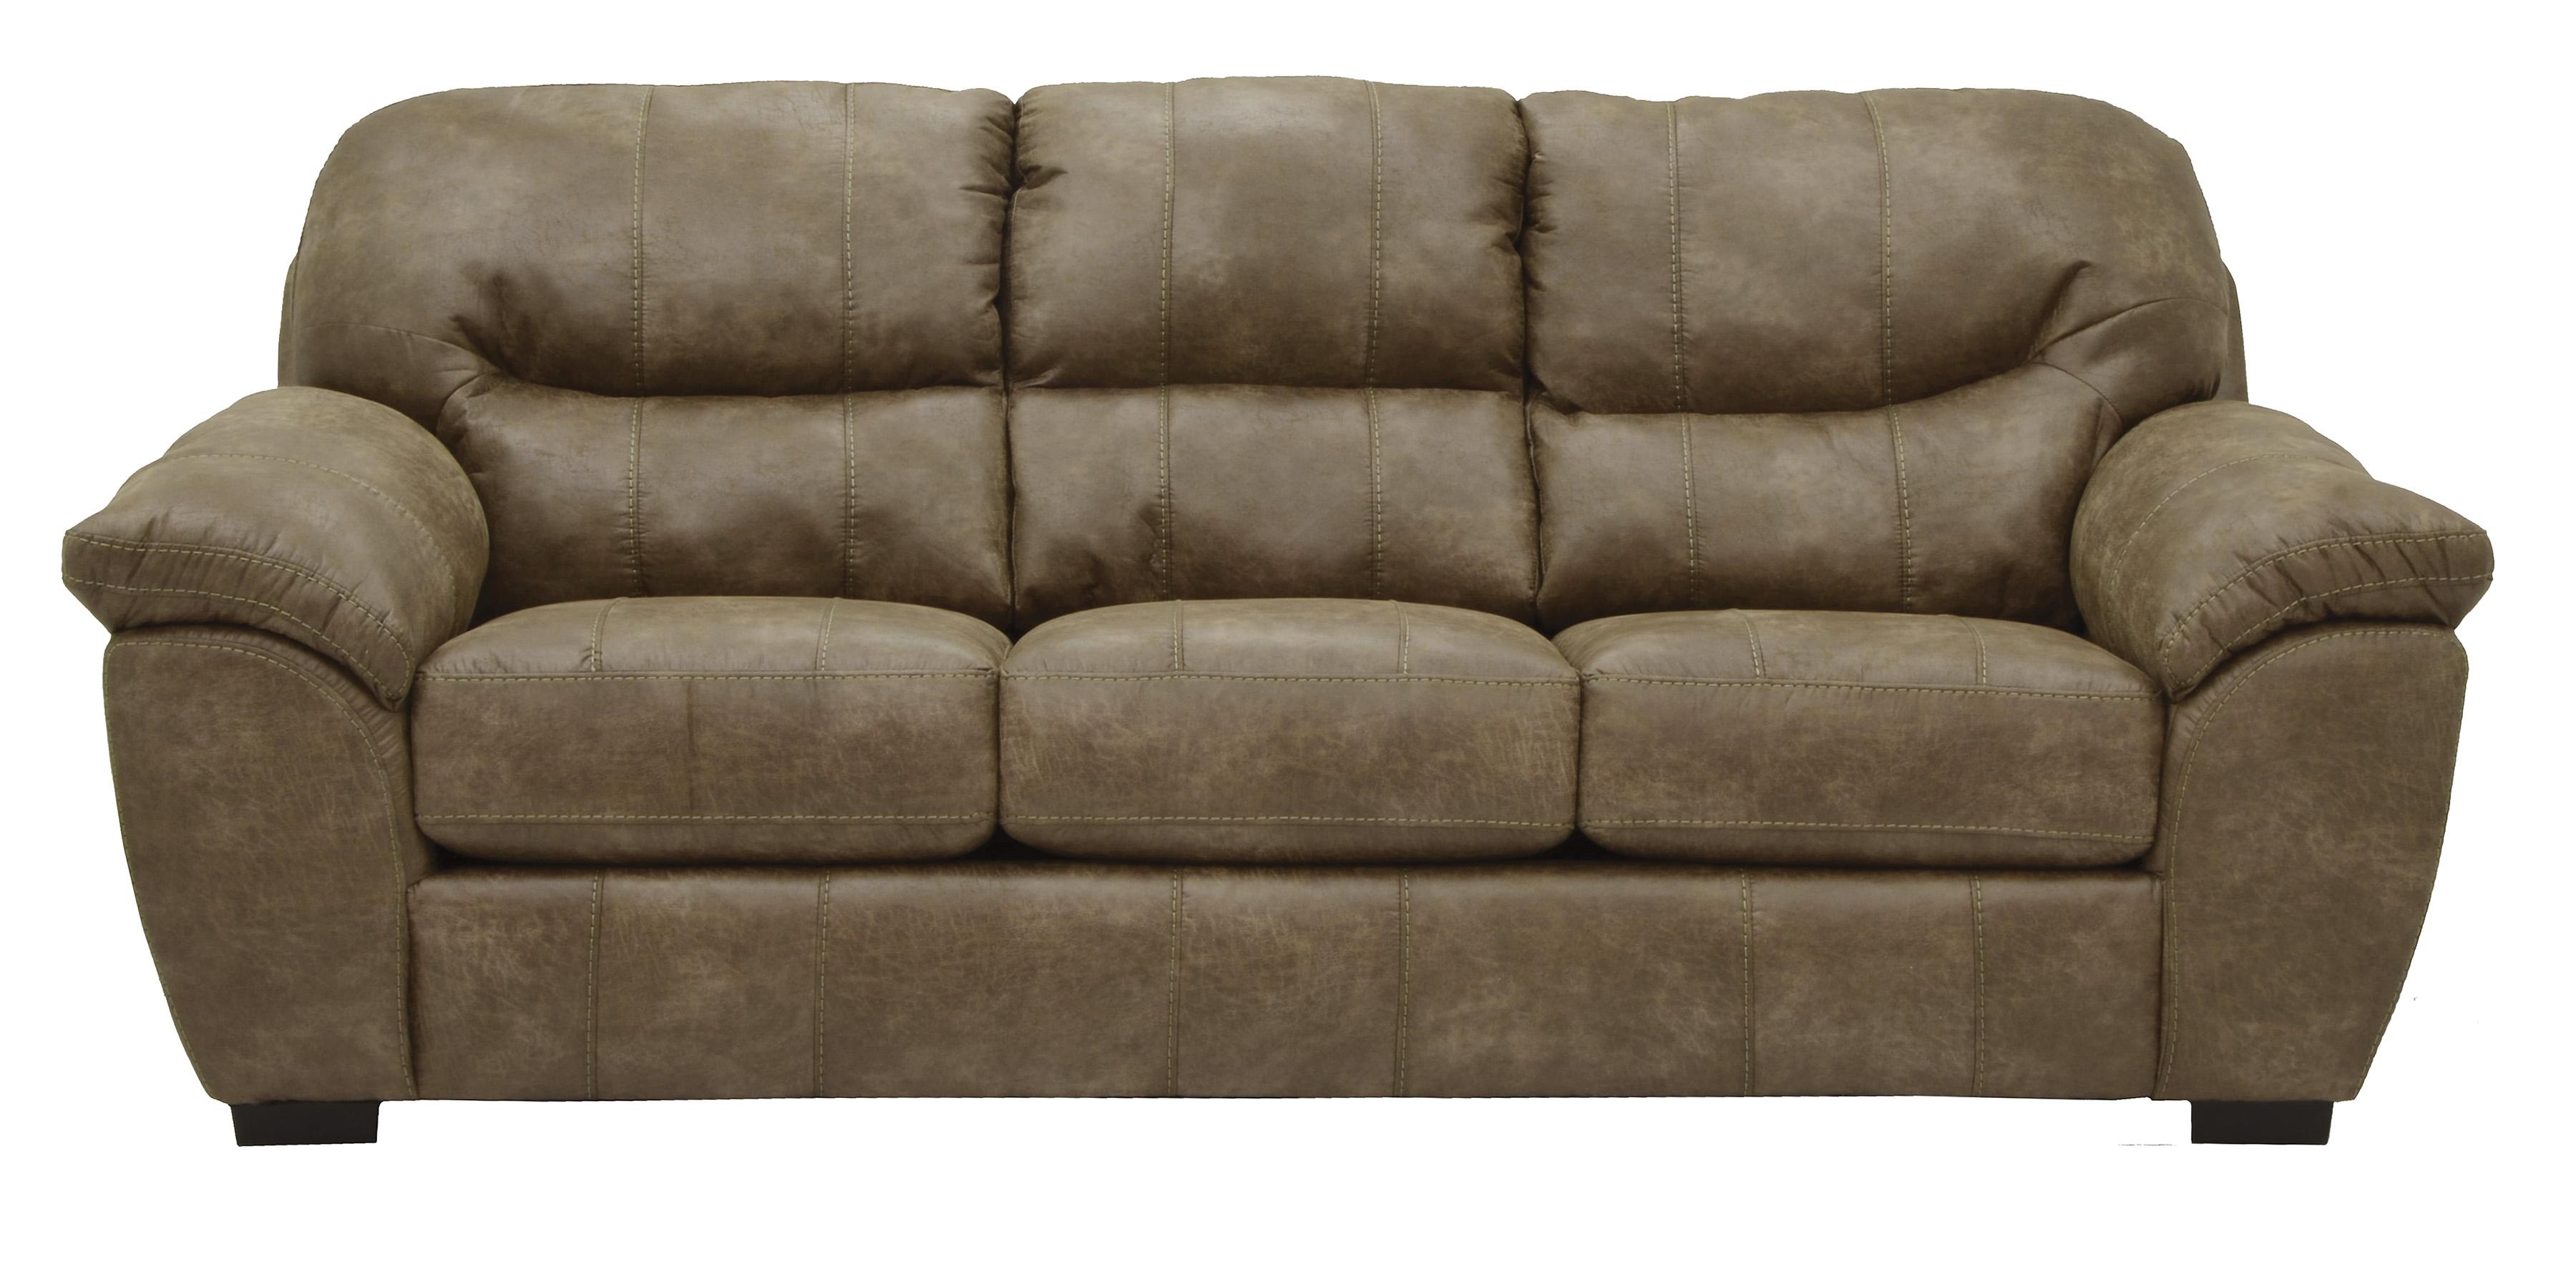 Grant 4453 Bonded Leather 96 Sofa